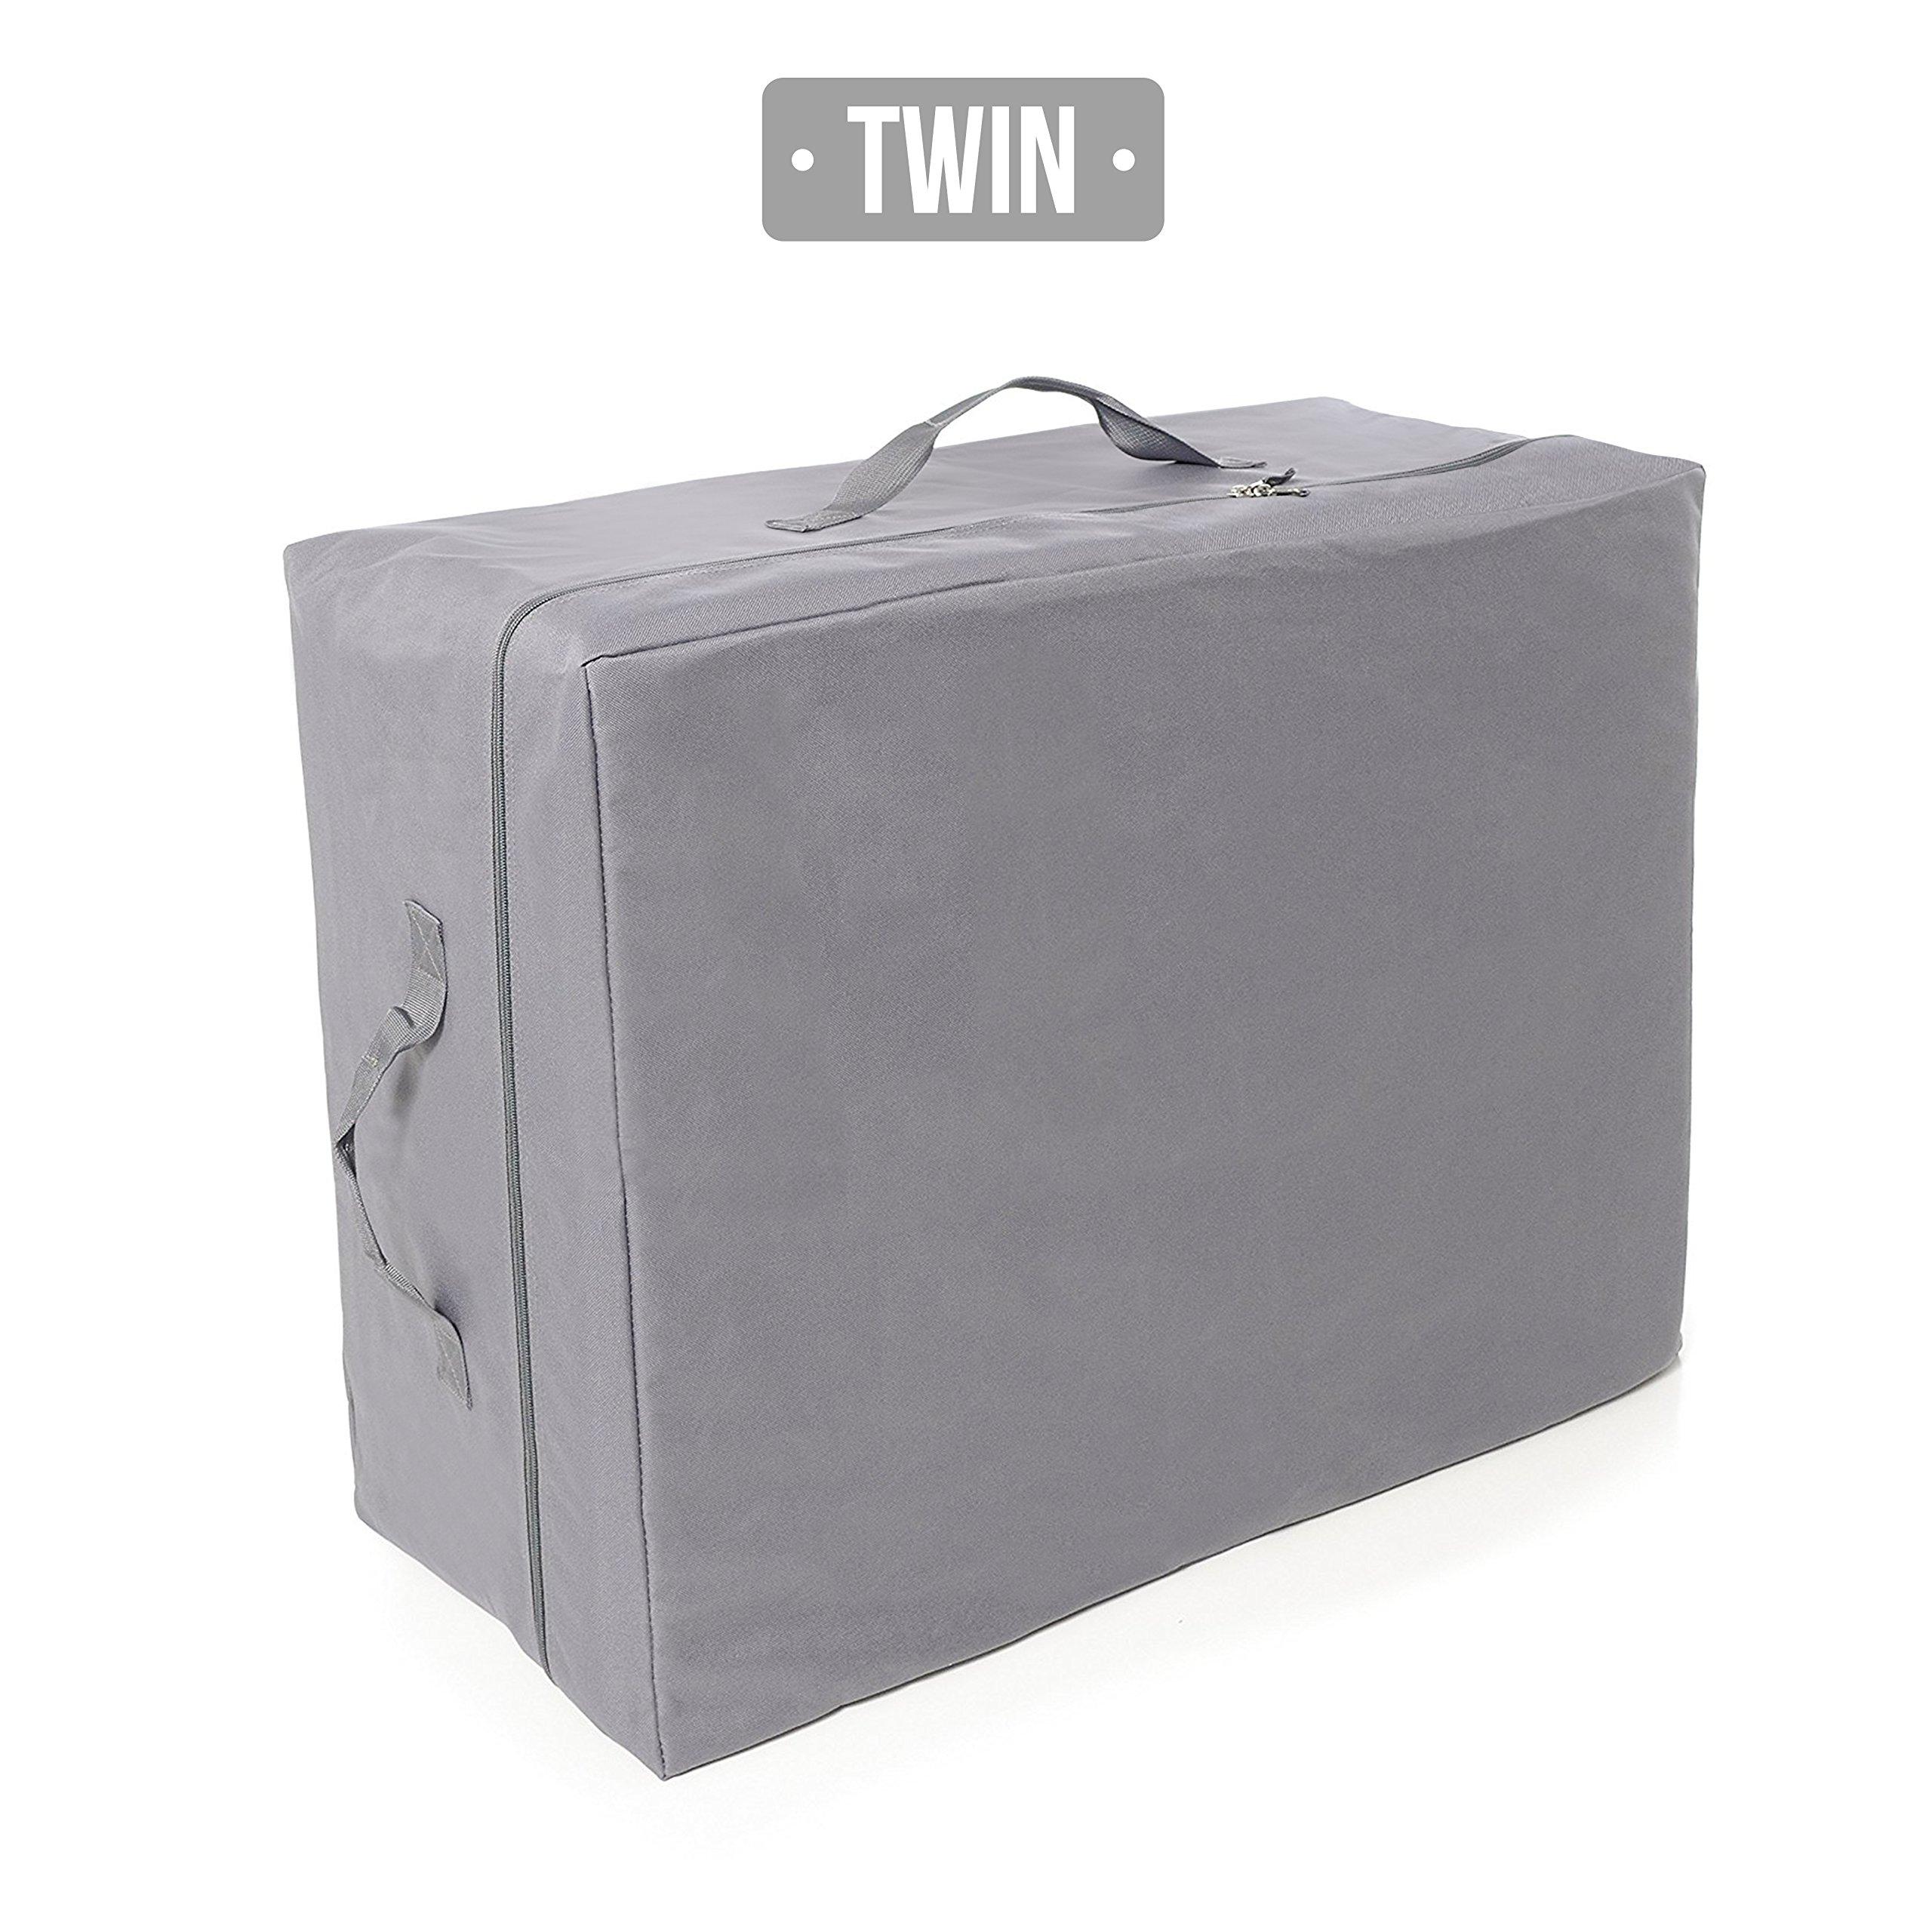 Carry Case For Milliard Tri-Fold Mattress (6'' Twin)